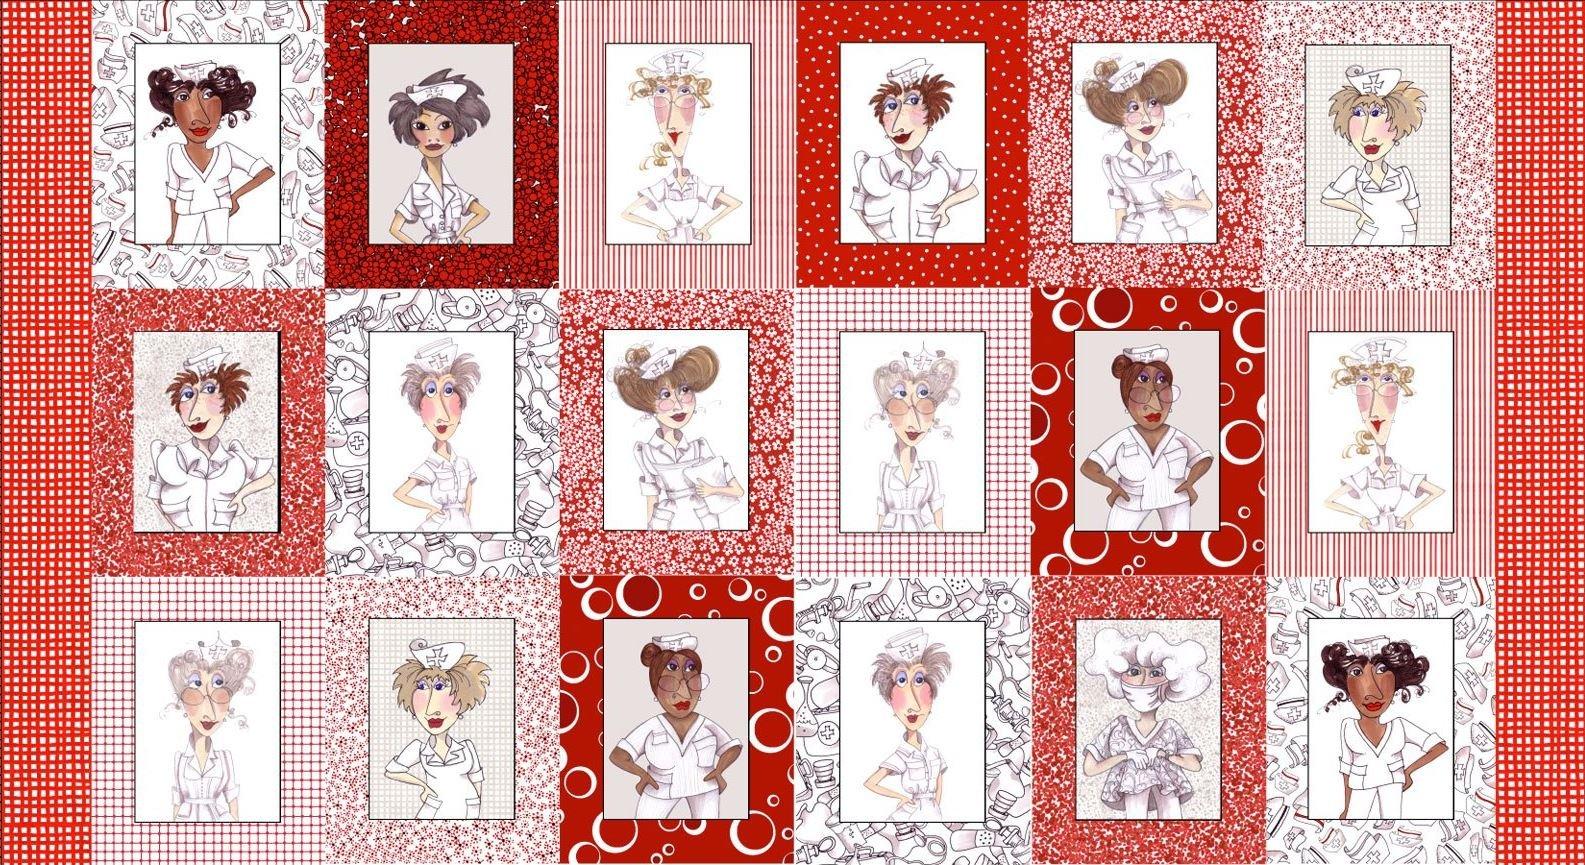 Nifty Nurses Fabric Panel by Loralie Designs